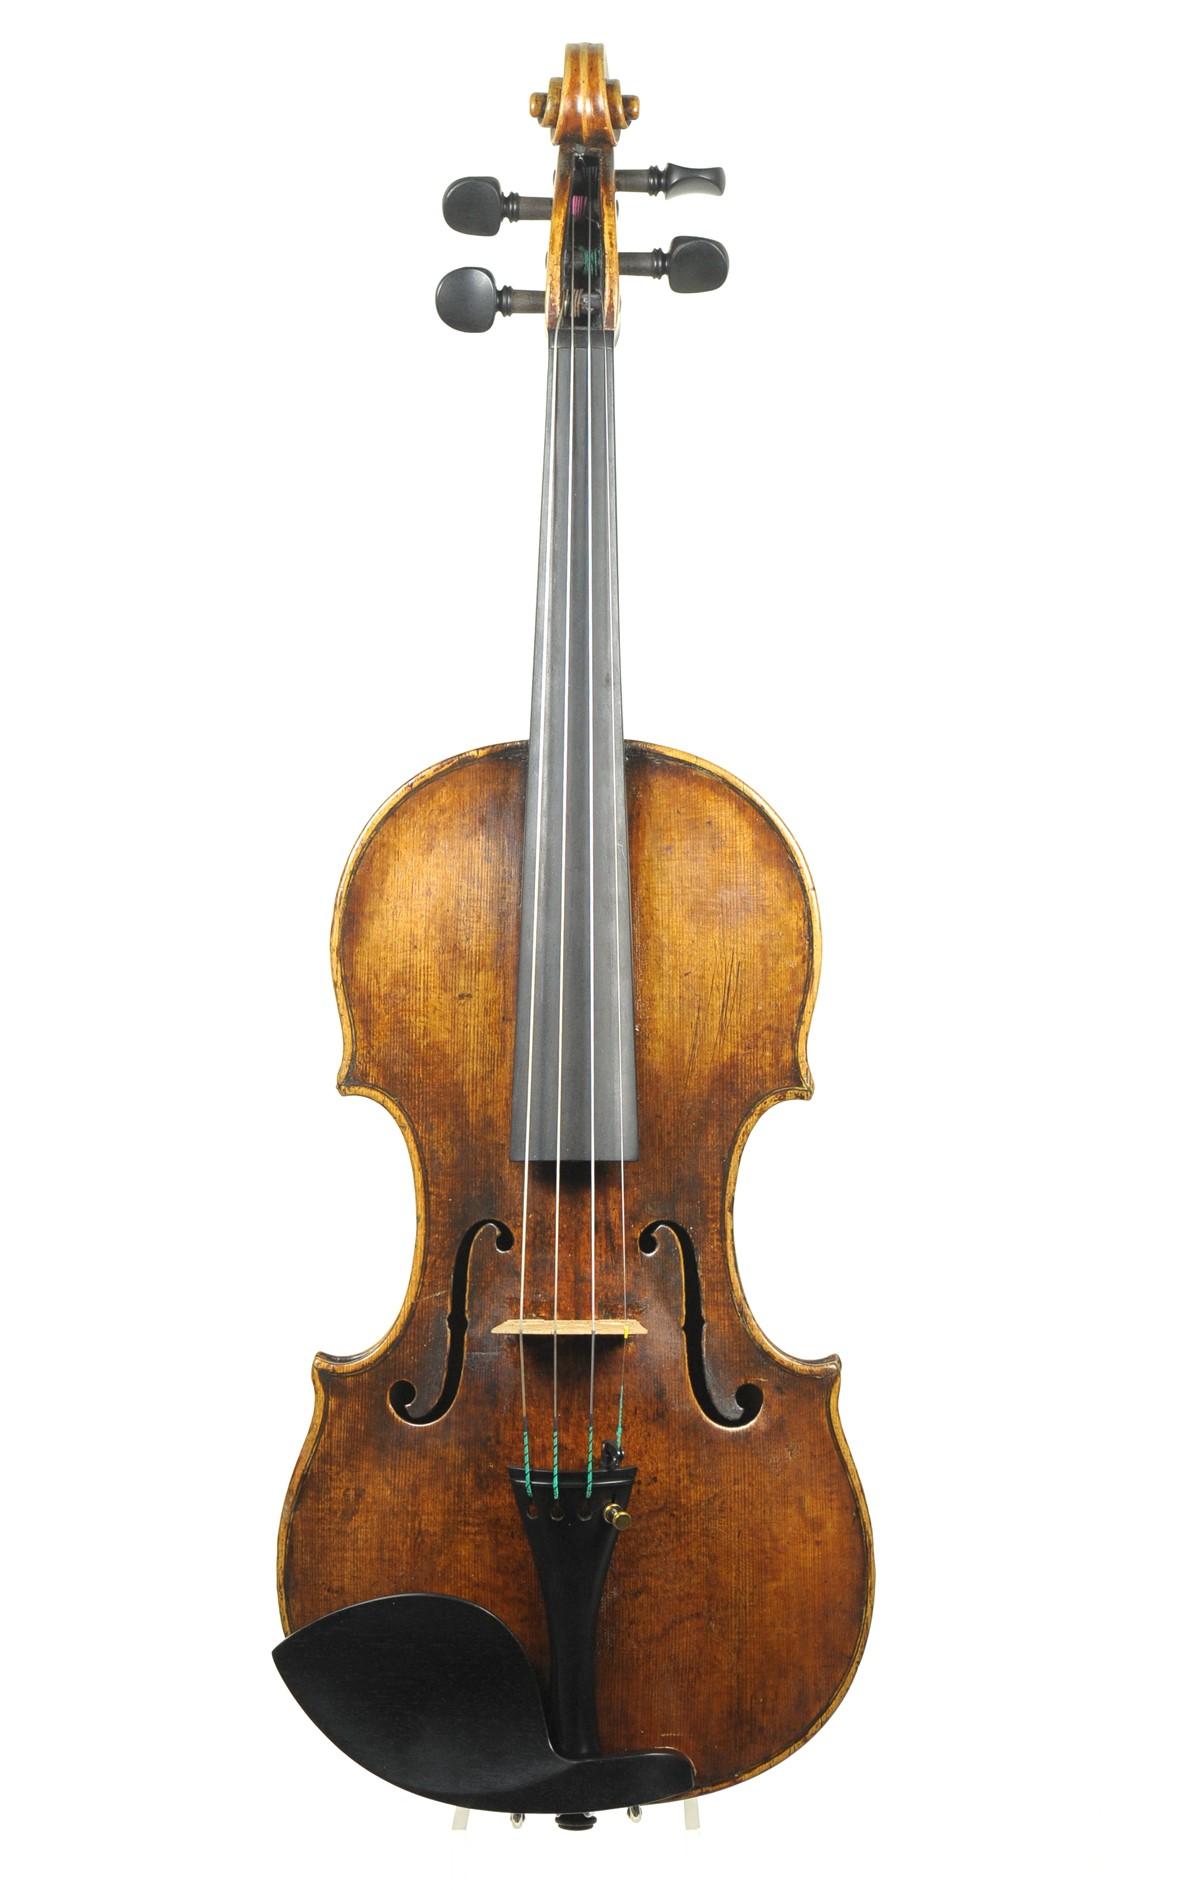 Georg II Carl Klotz: reife Mittenwalder Violine um 1780 - Decke